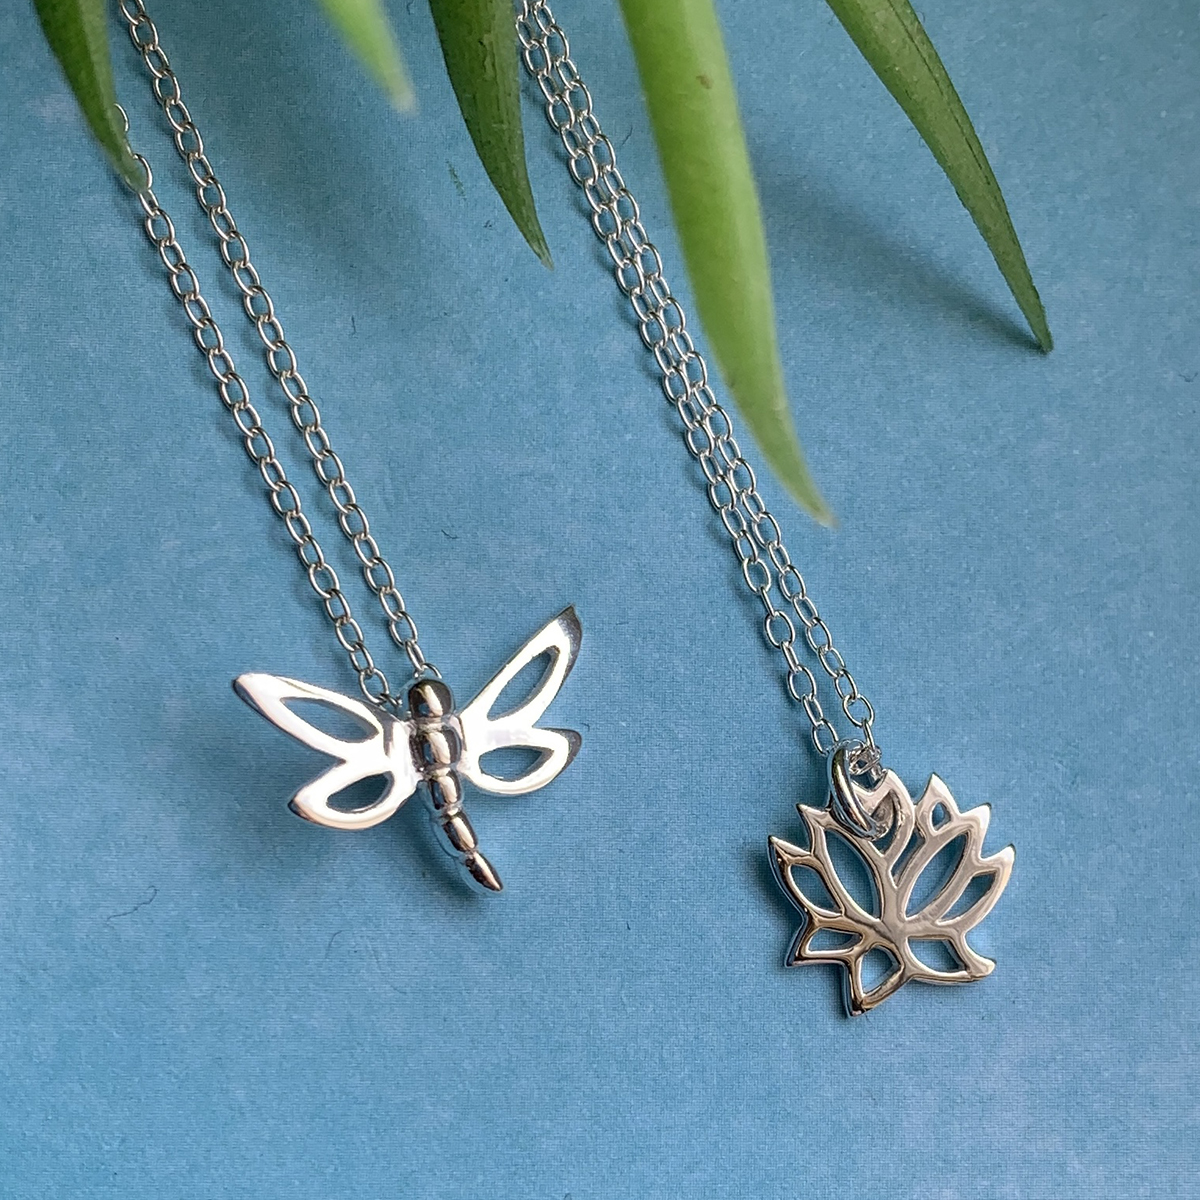 Mindful Jewellery Charm Necklace Photoshoot